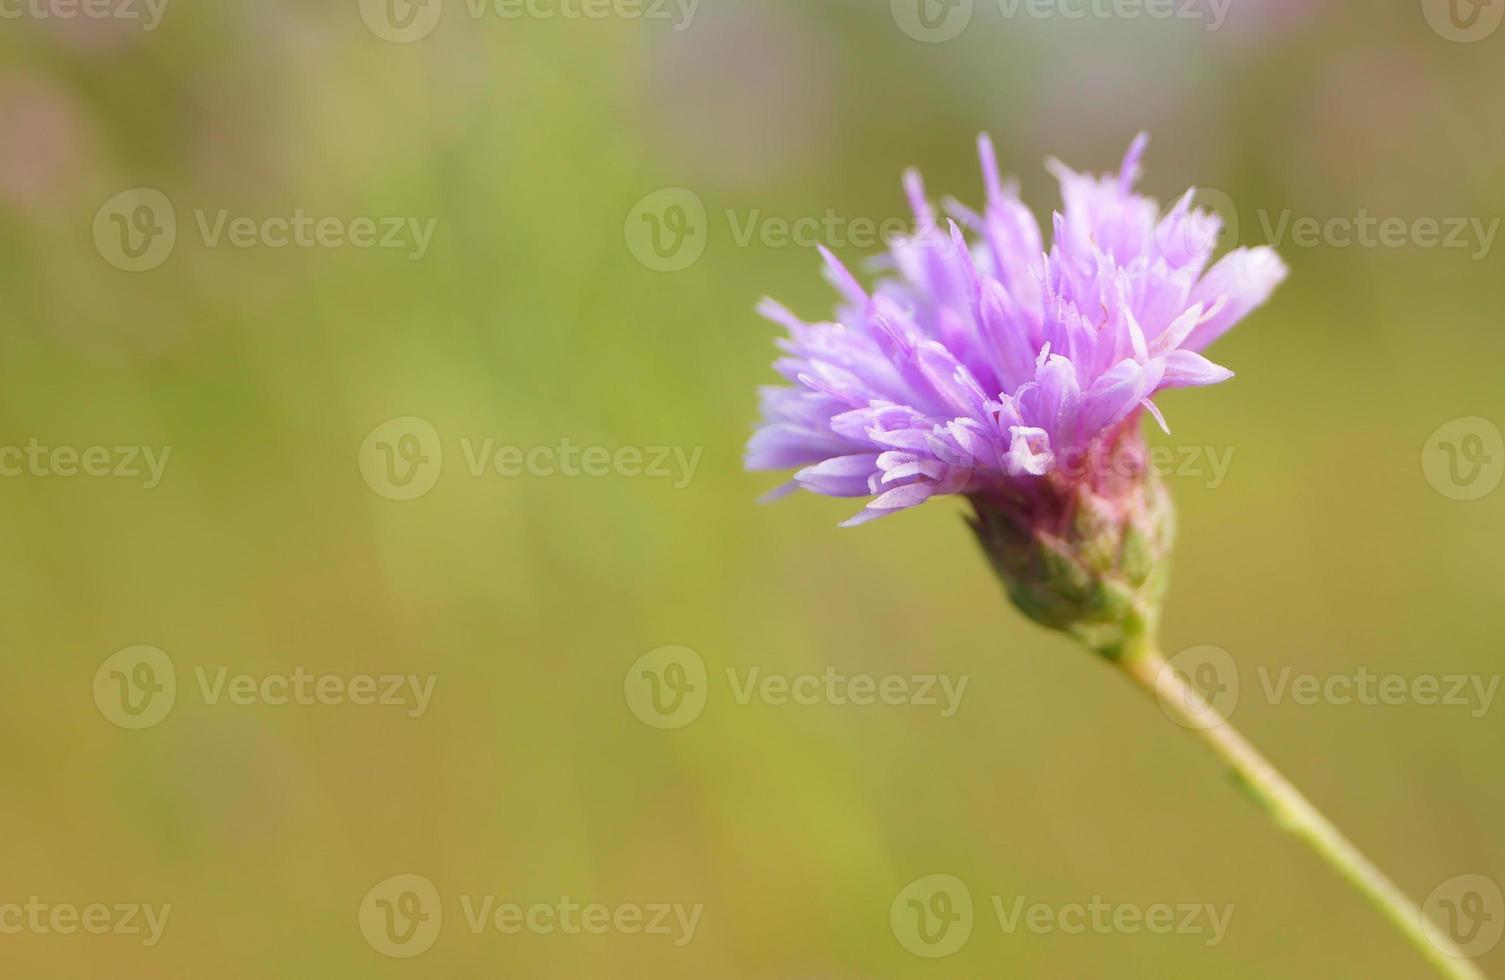 wilde Blume - camcheya tenuifolia kerr foto